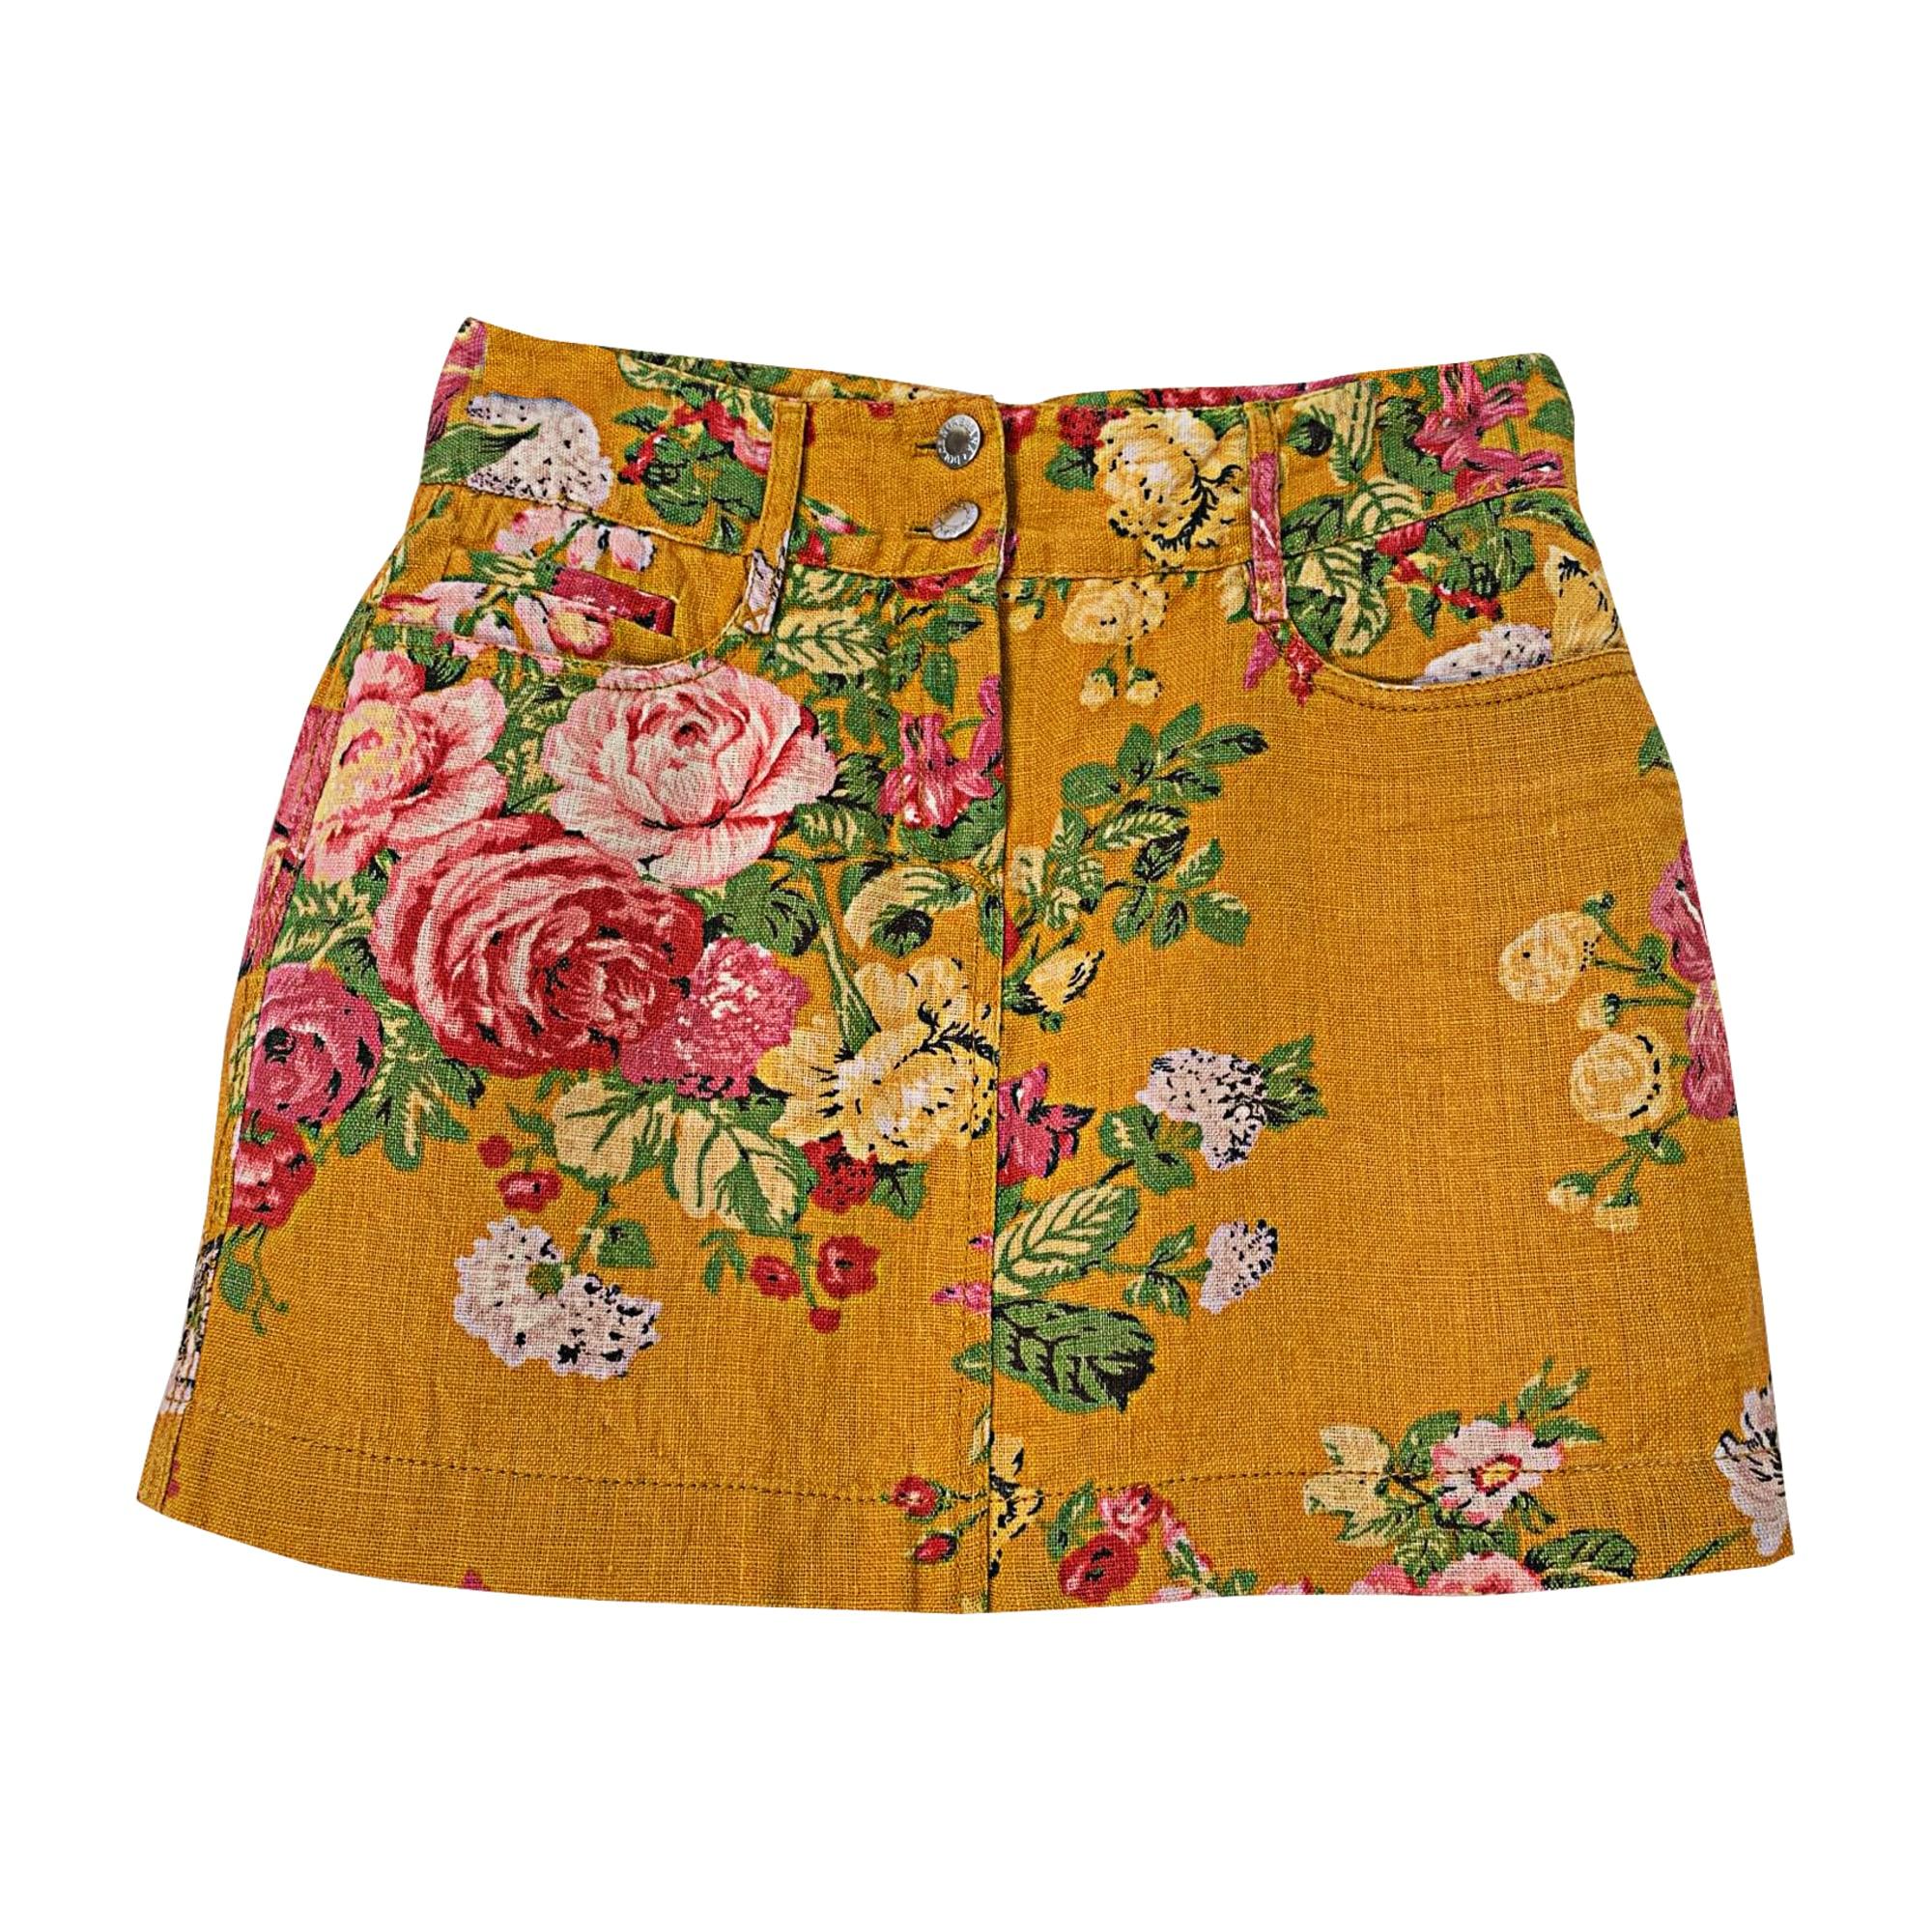 Mini Skirt DOLCE & GABBANA Yellow